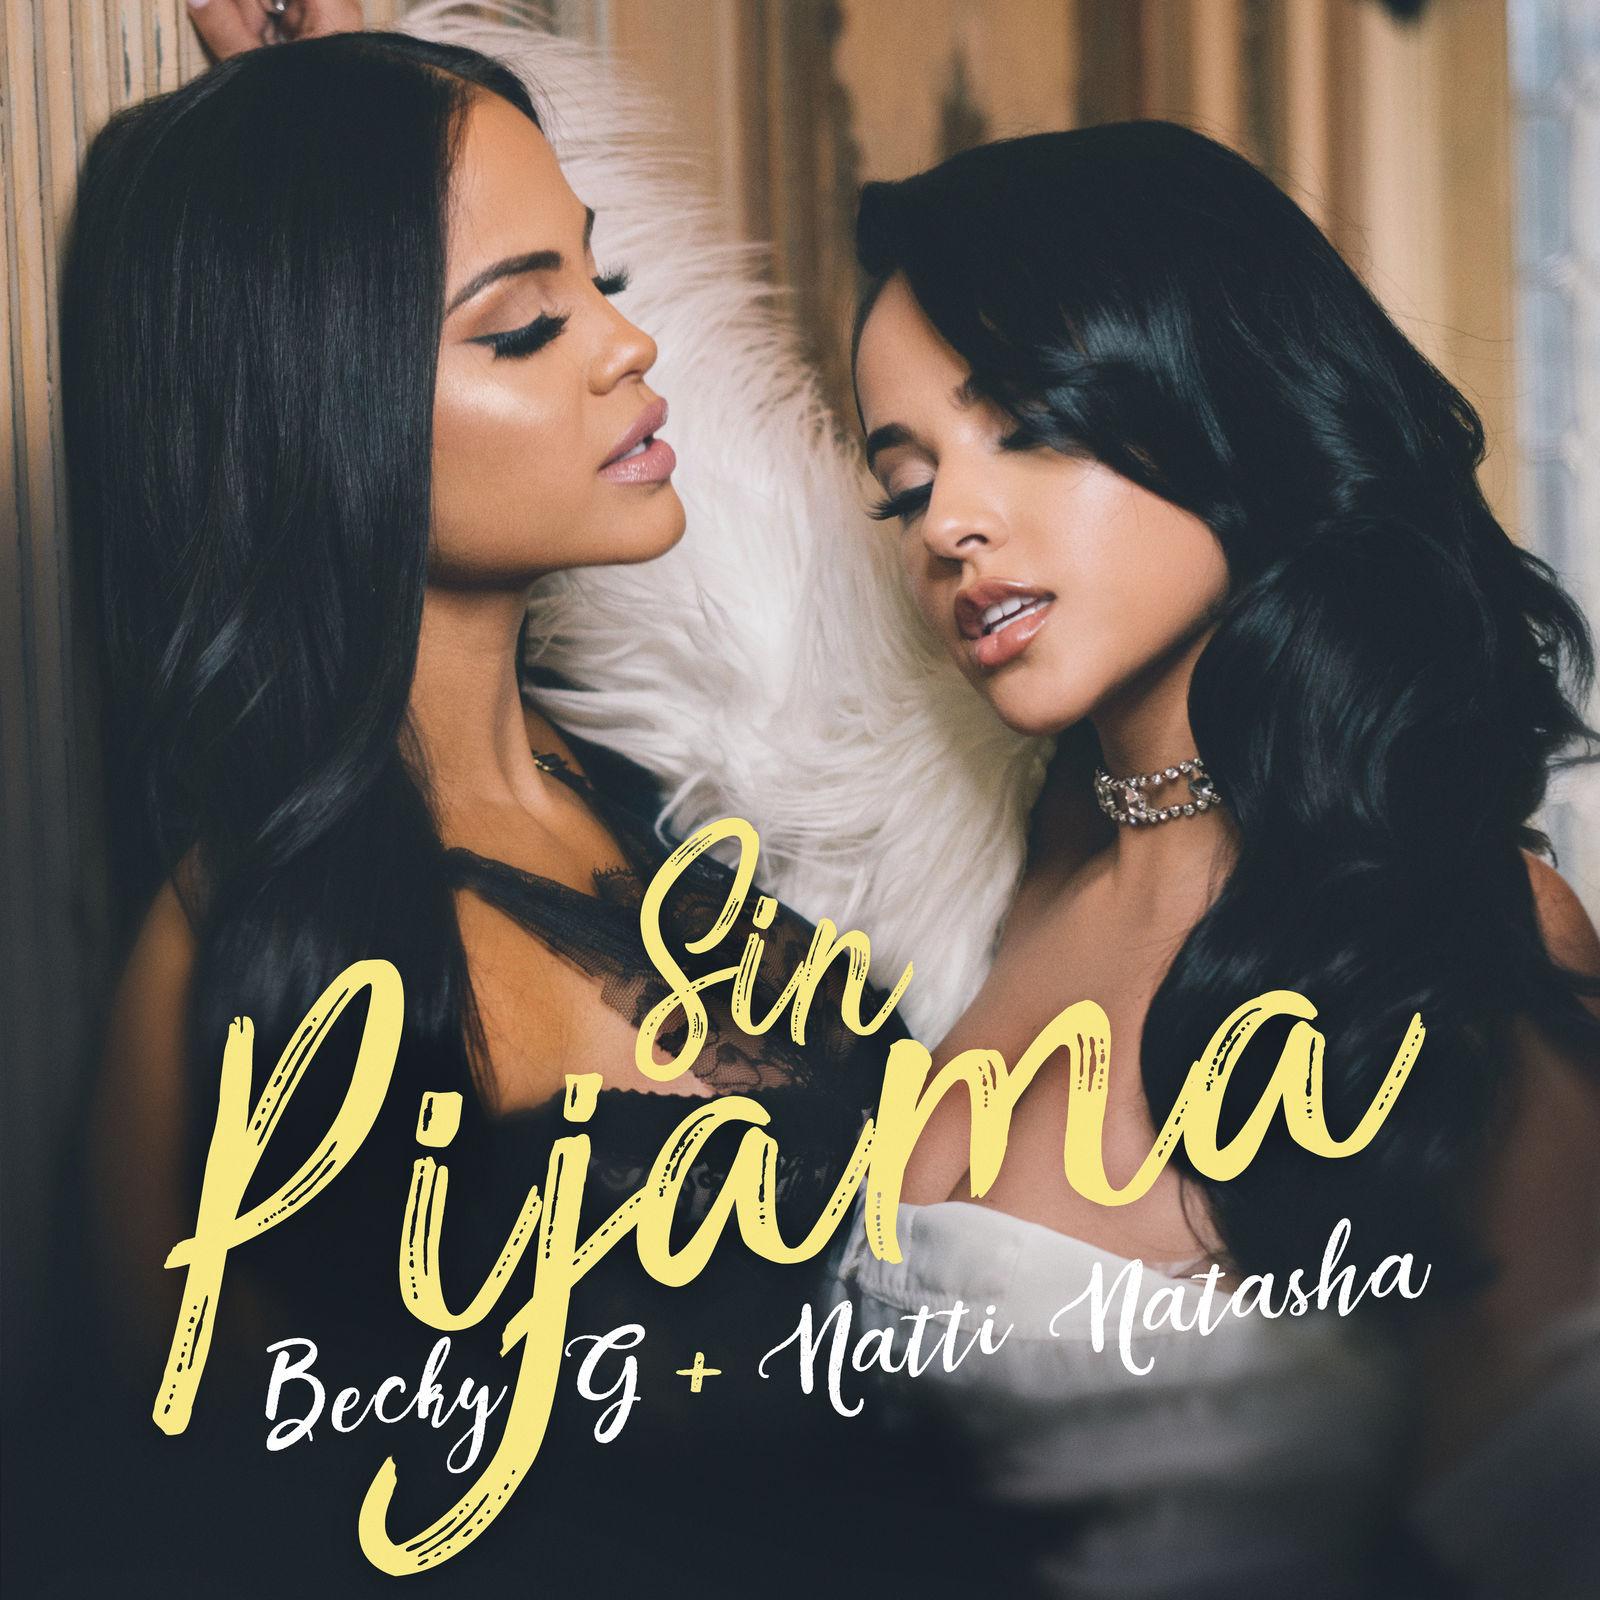 Sin pijama (Explicit edition)